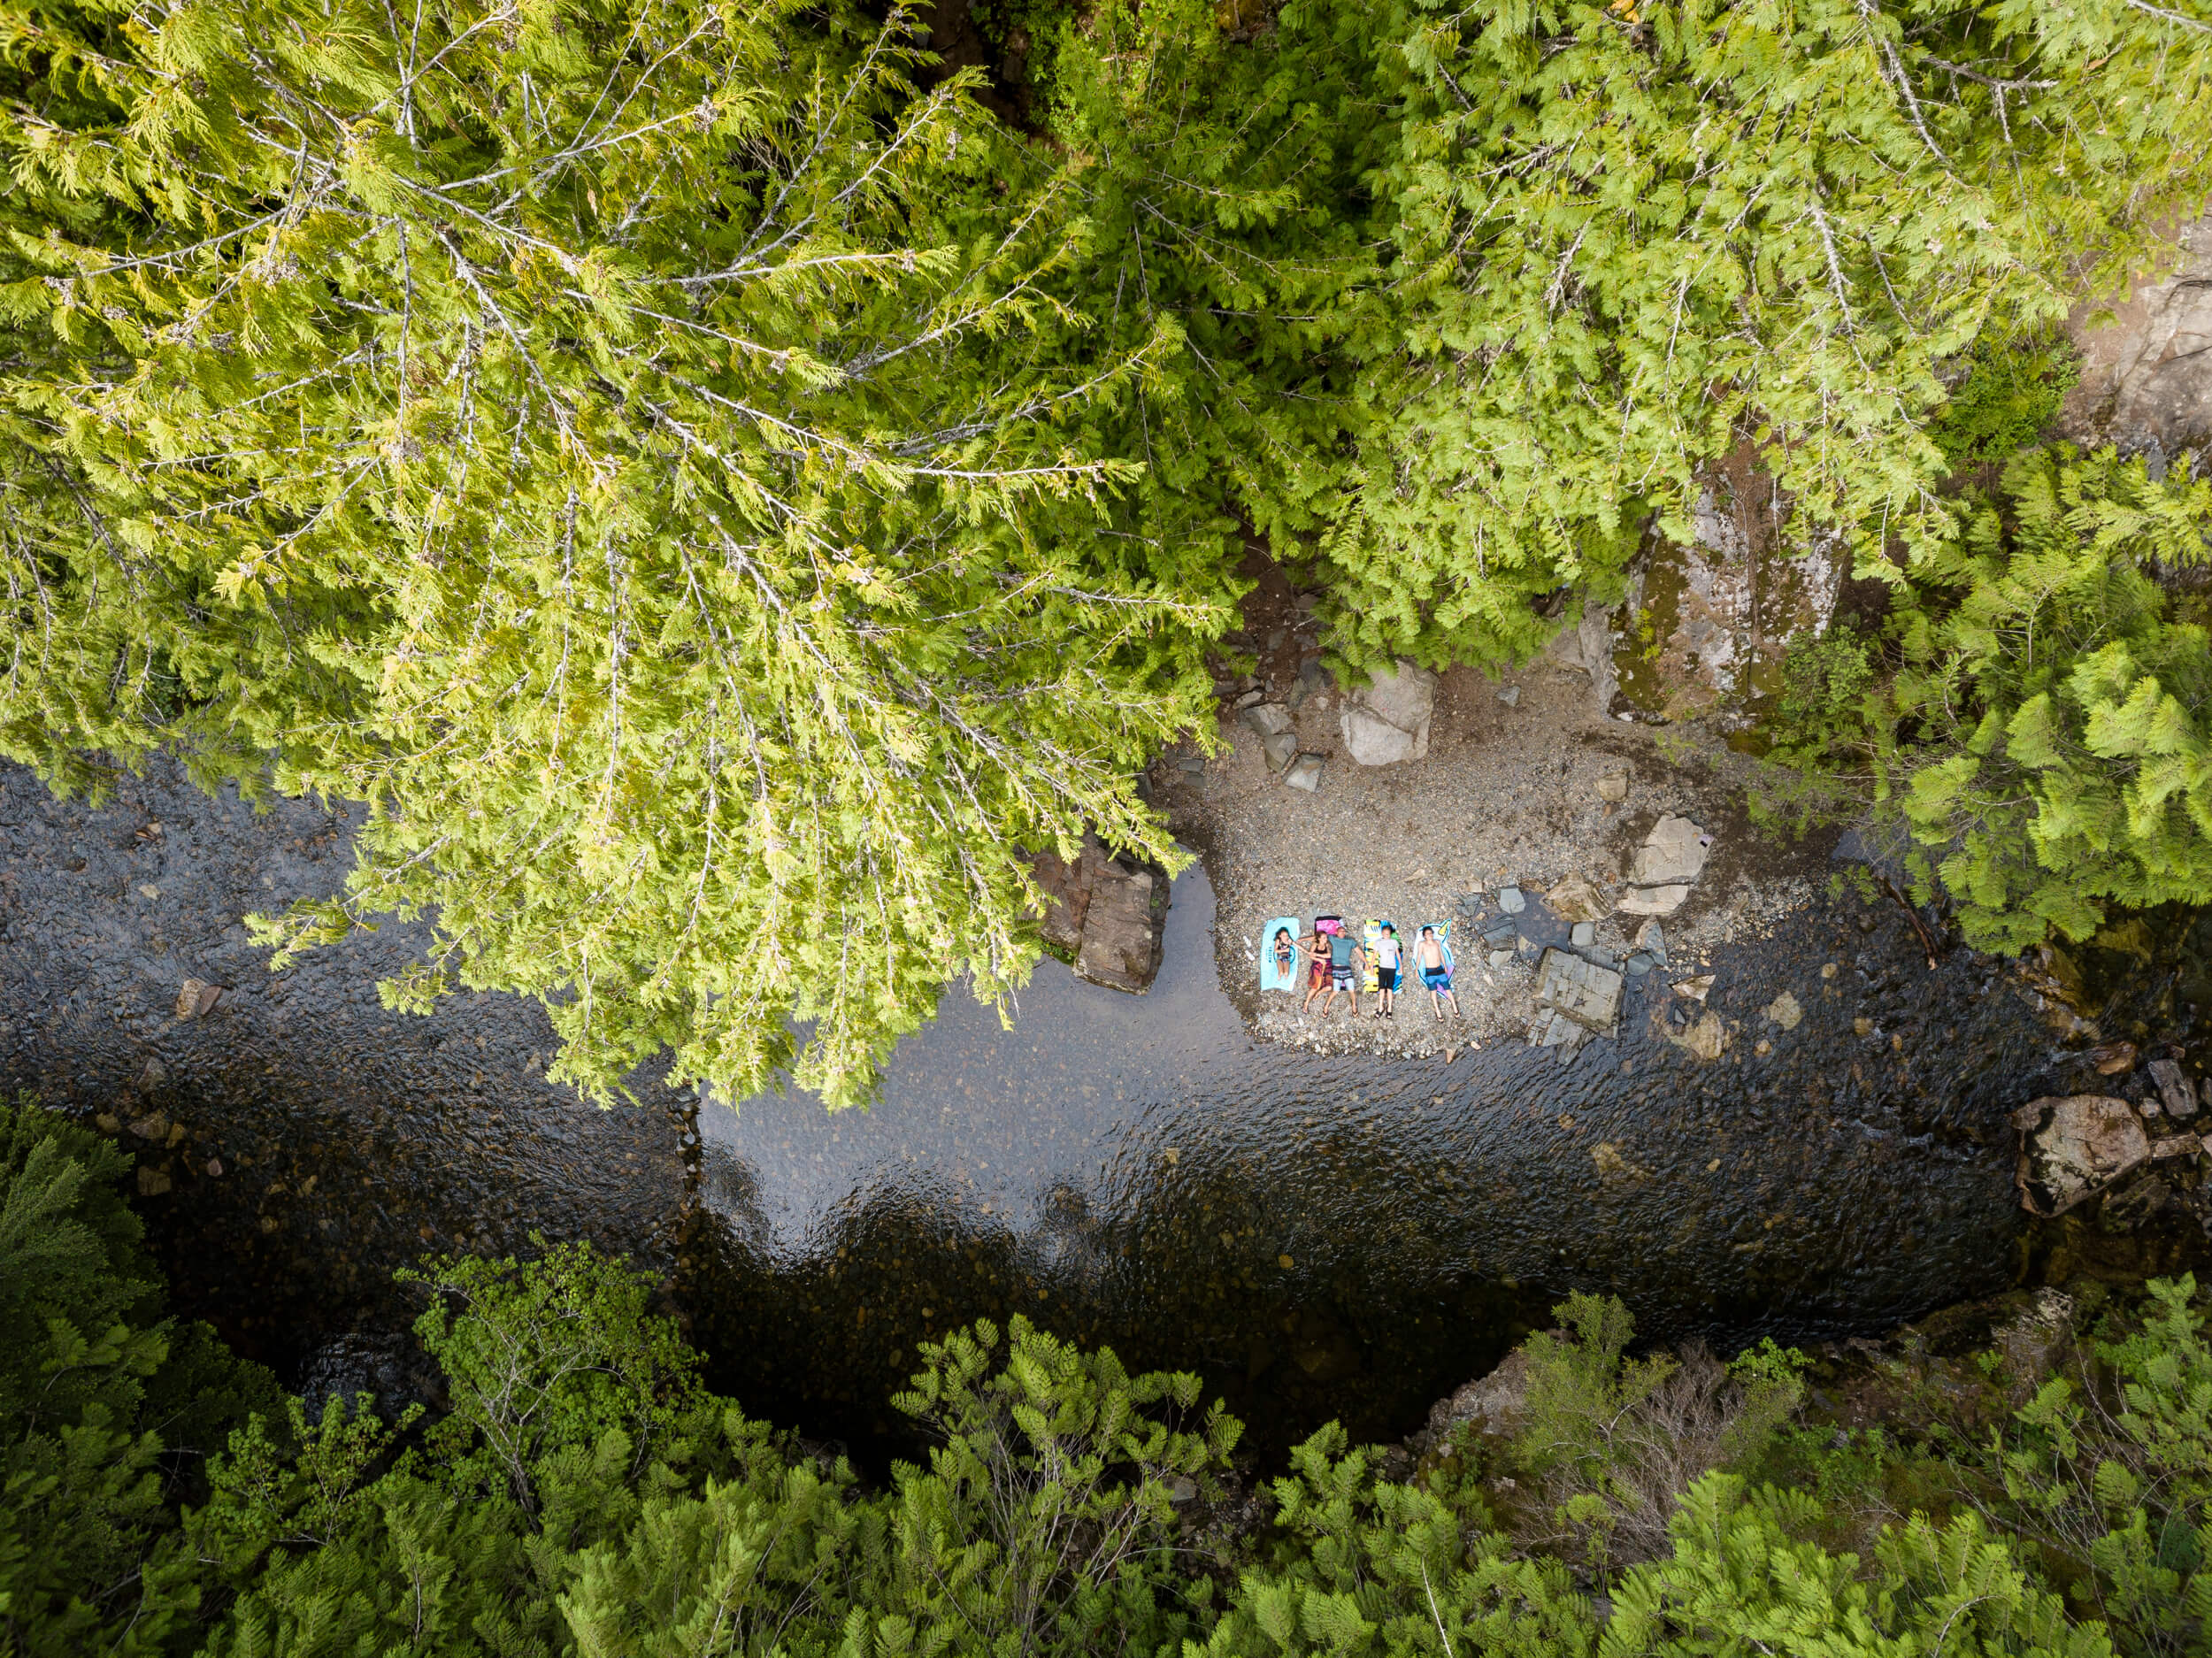 people sunbathing along the tree-lined riverbank at Western Pleasure